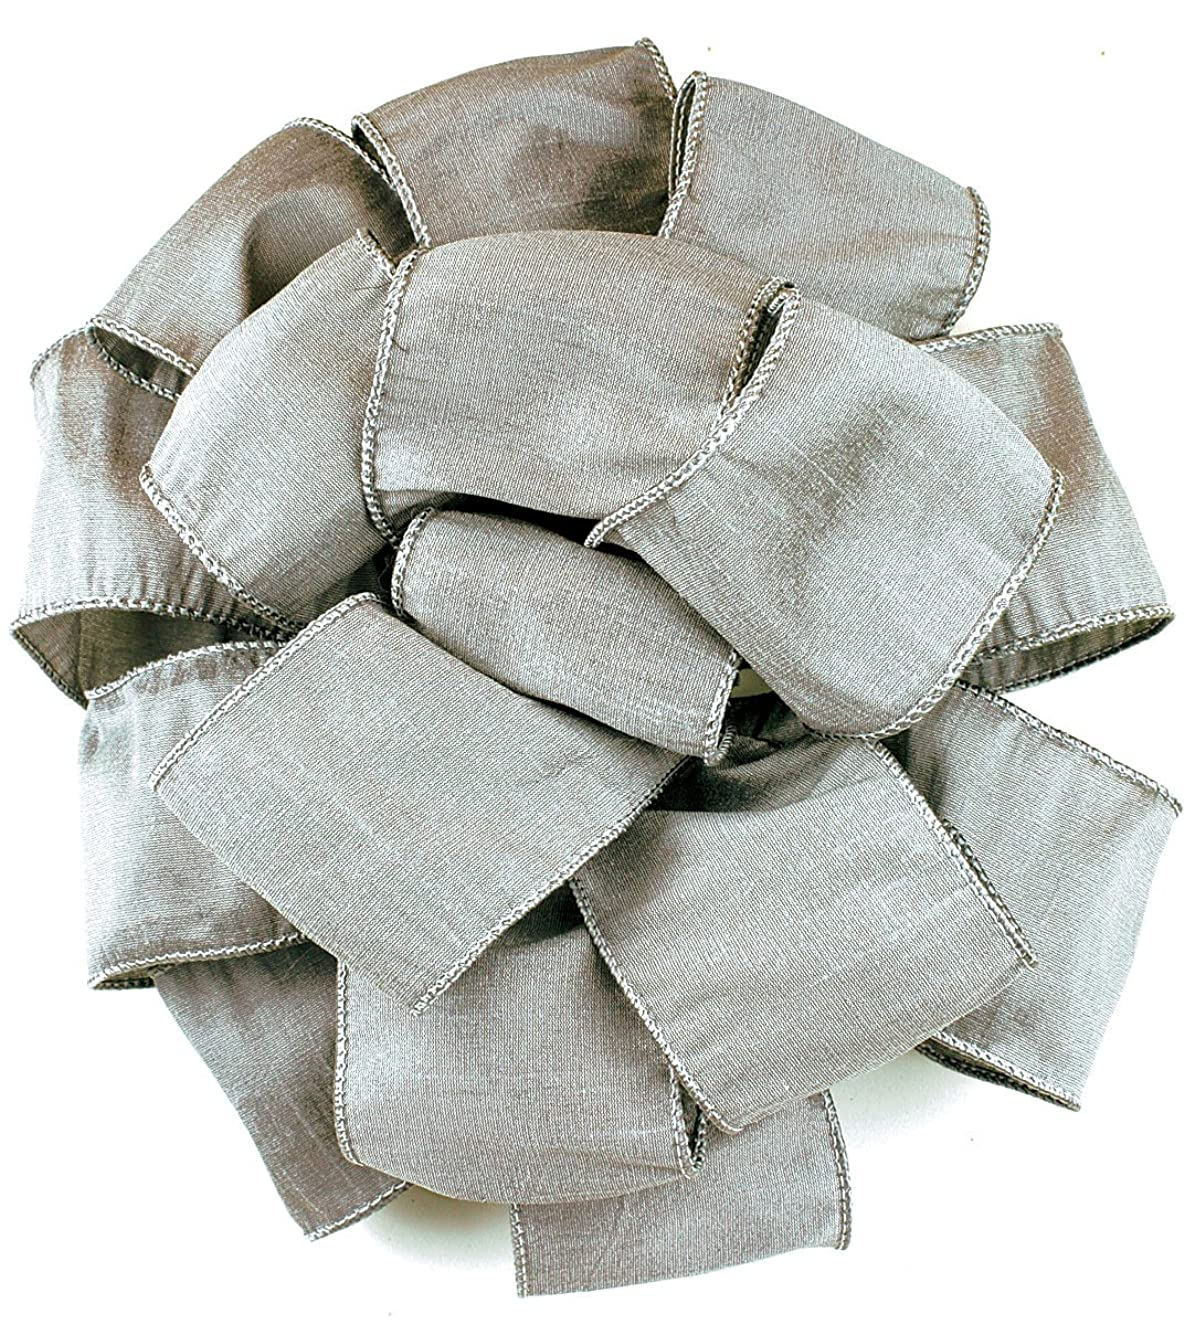 Offray Wired Edge Anisha Craft Ribbon, 4-Inch Wide by 10-Yard Spool, Silver